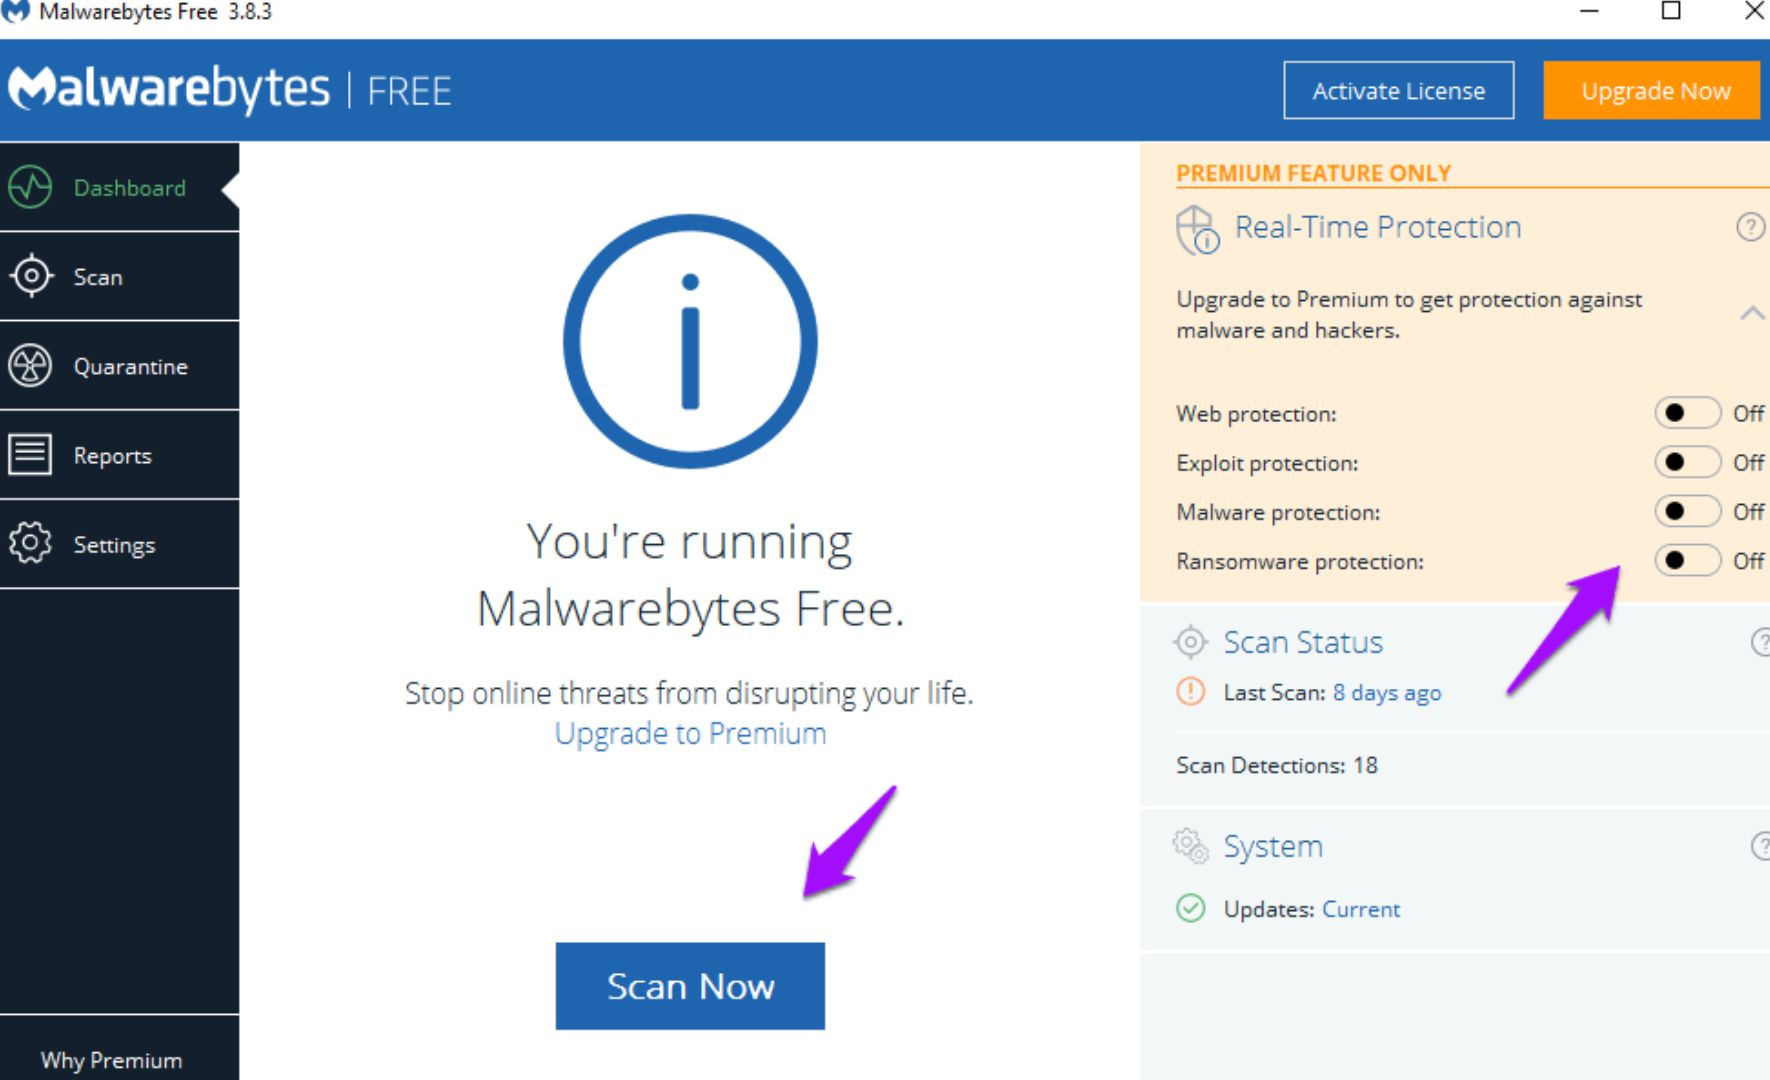 Malwarebytes safe to use